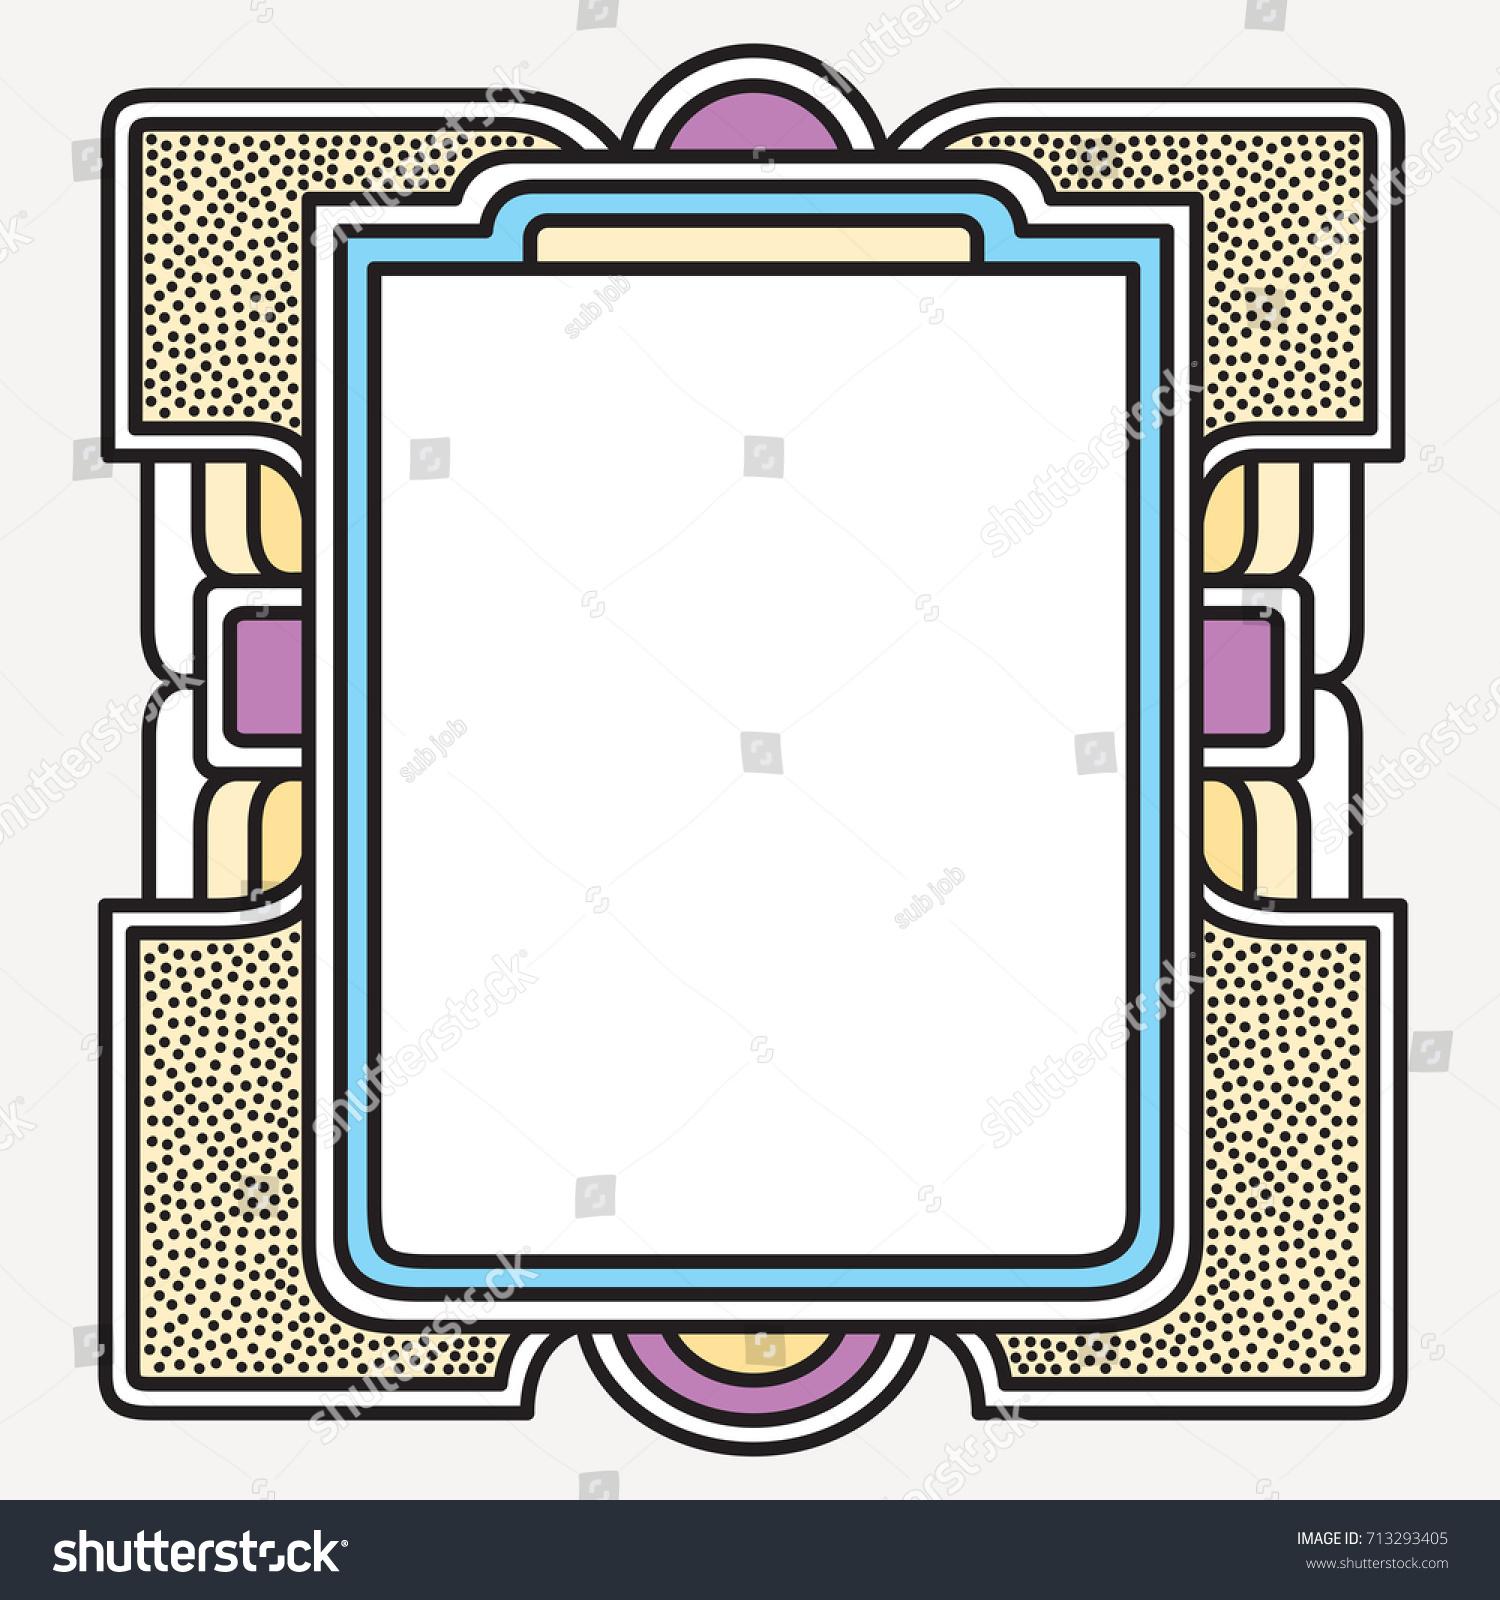 vector frame art graphics dynamic frames stylish geometric white background element for design invitations - Dynamic Frames